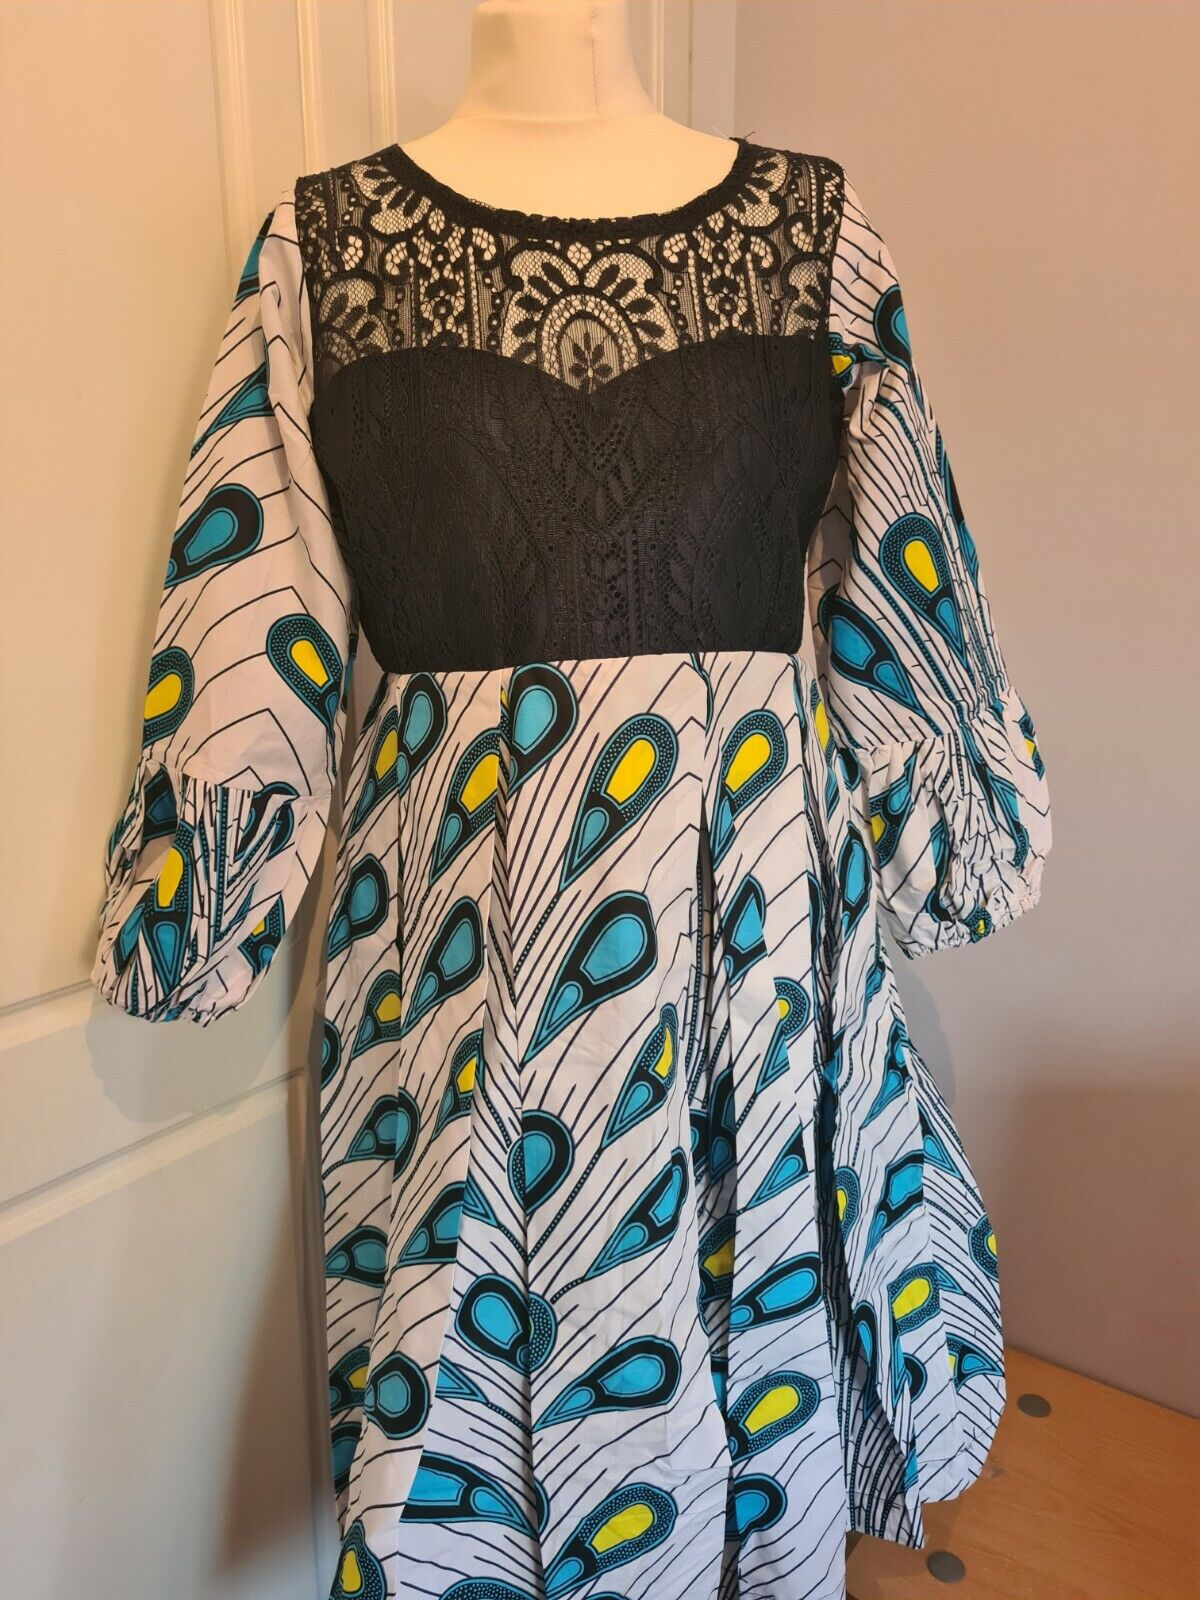 Modern Ankara mix dress. Fits Size 12 to 14